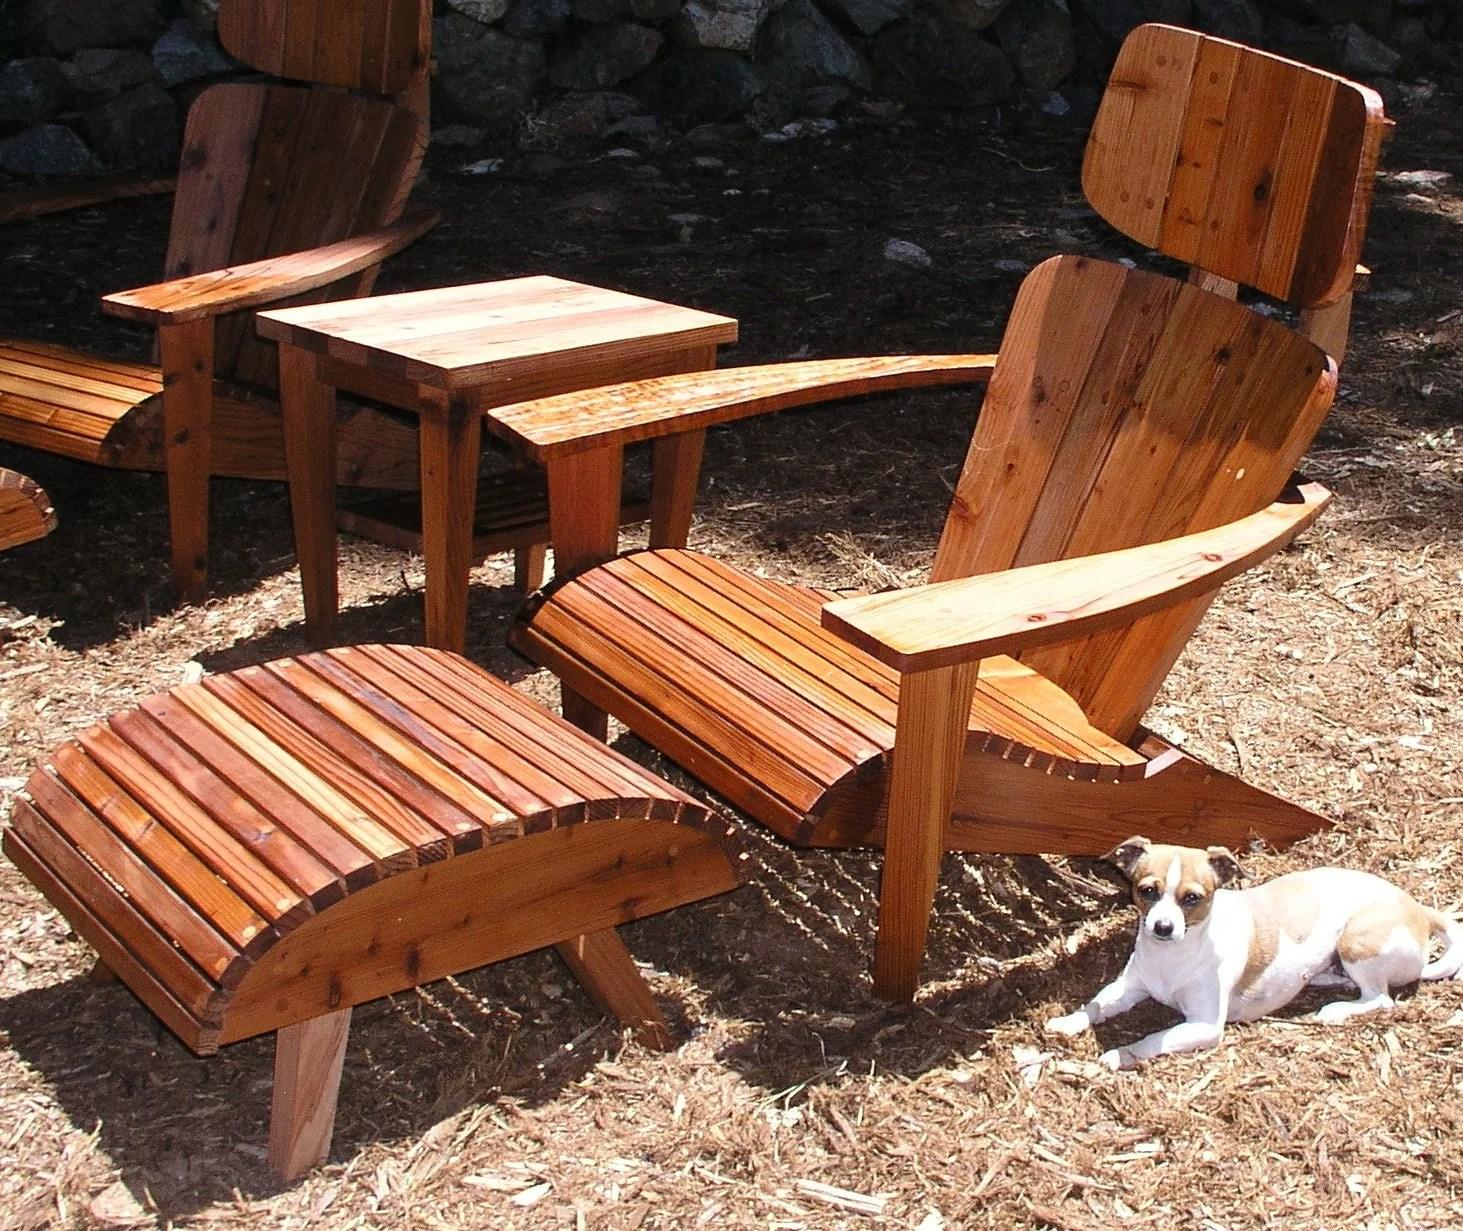 modern adirondack chair club slipcovers white set headrest ottoman and side